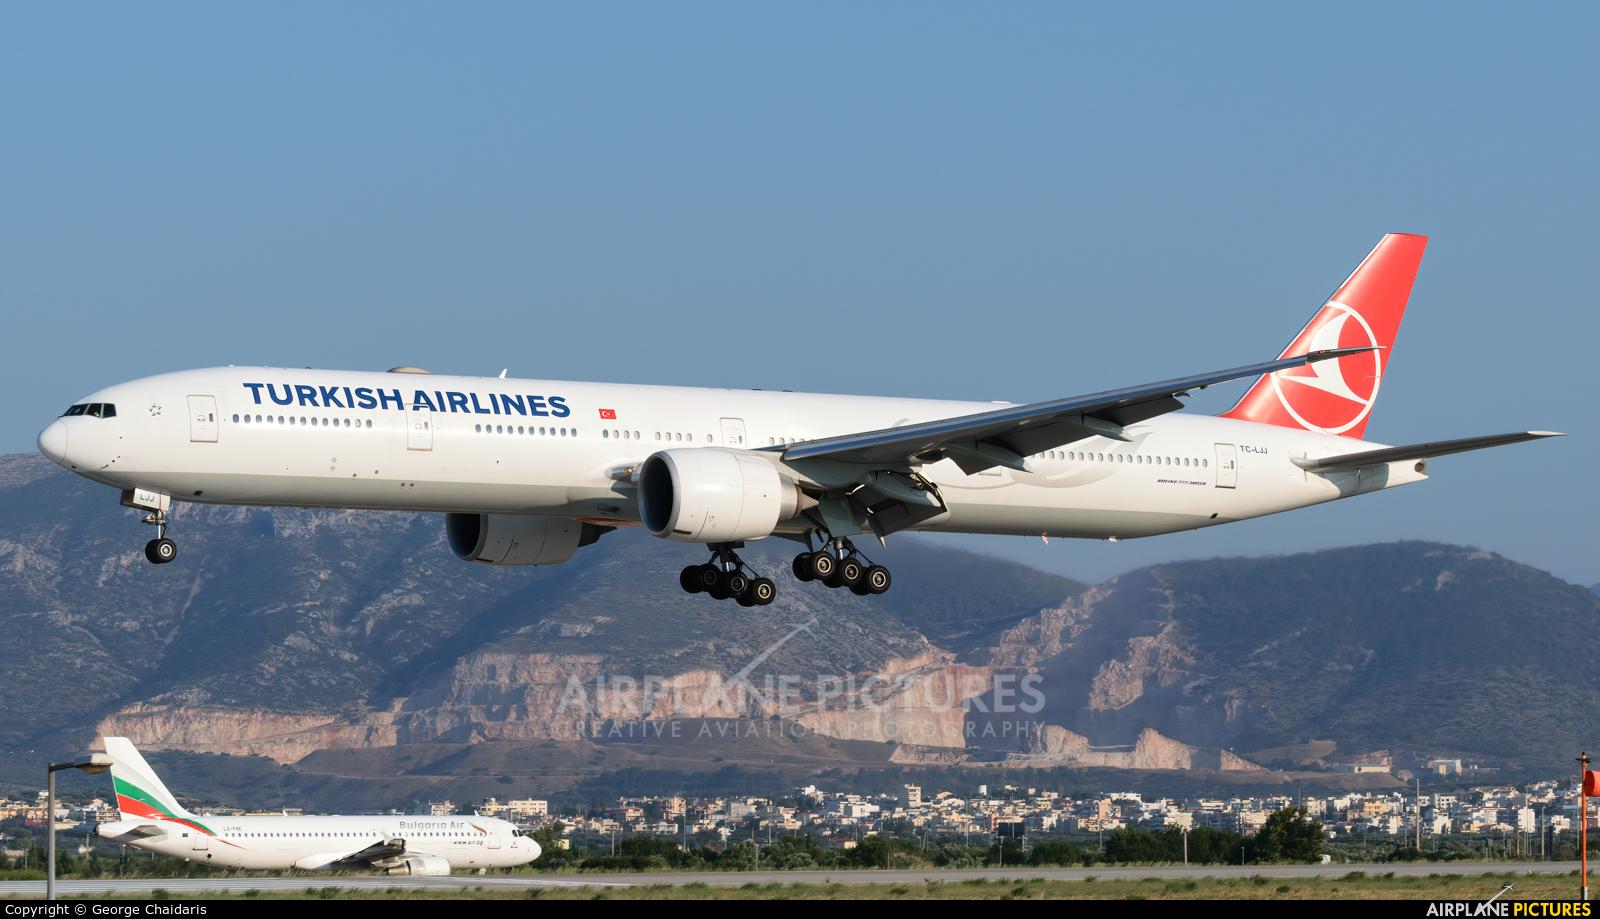 Turkish Airlines TC-LJJ aircraft at Athens - Eleftherios Venizelos